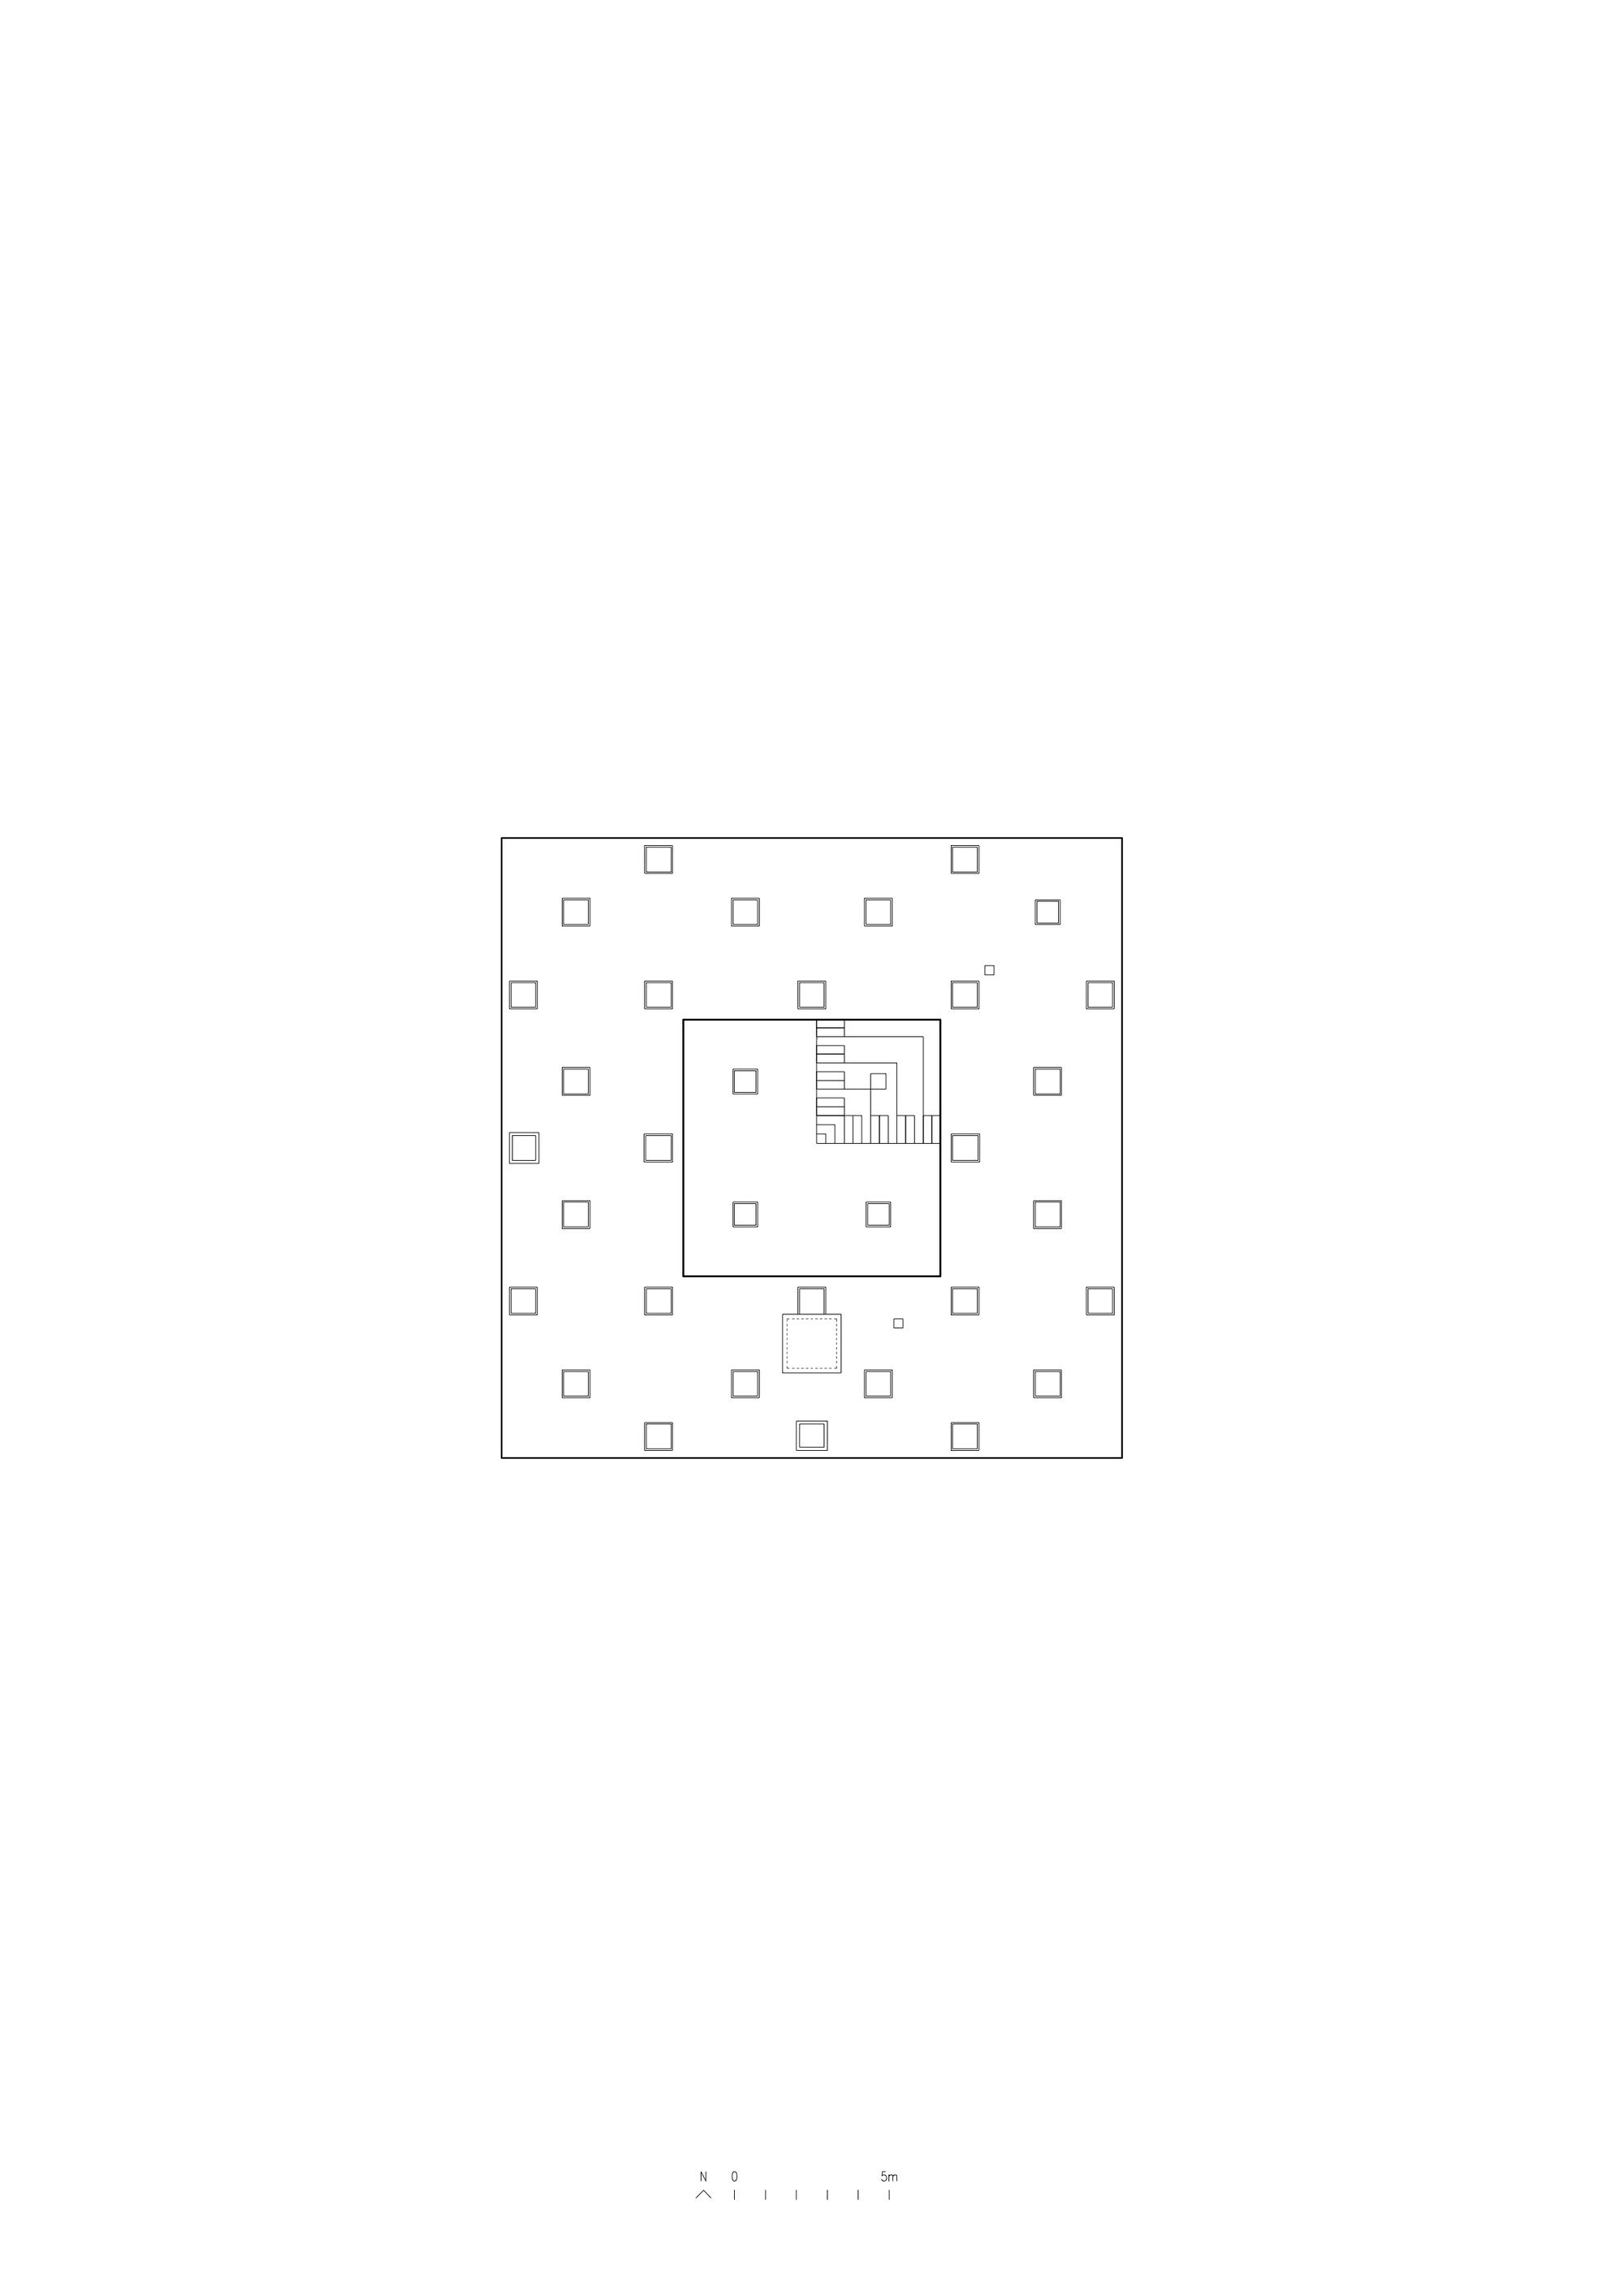 54aaf756e58ecec5300000c7_guna-house-pezo-von-ellrichshausen_pve_guna_05_plan_03